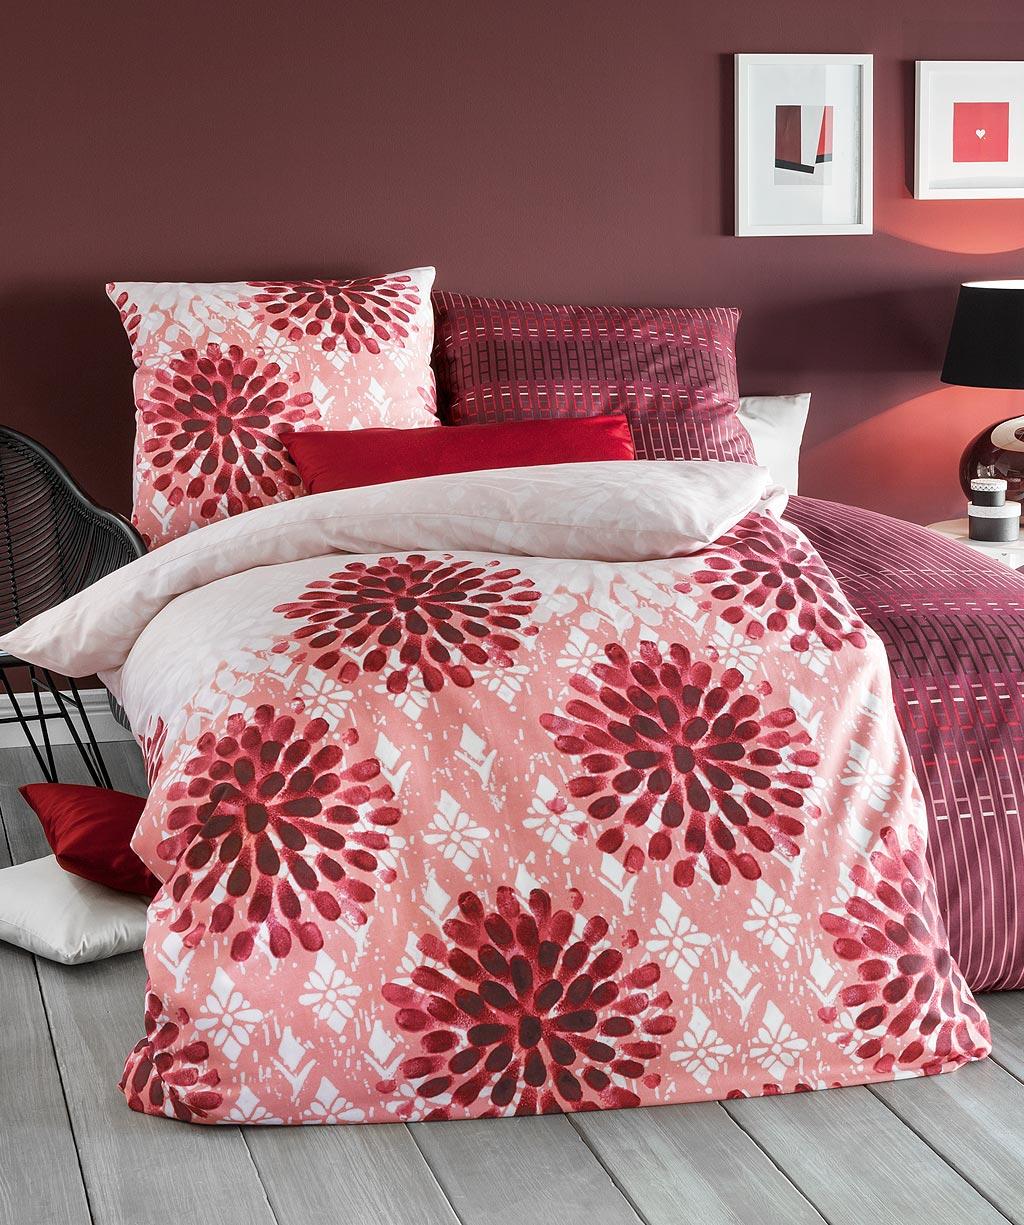 fleuresse bettw sche 200x220 reduziert sale ladyproject. Black Bedroom Furniture Sets. Home Design Ideas